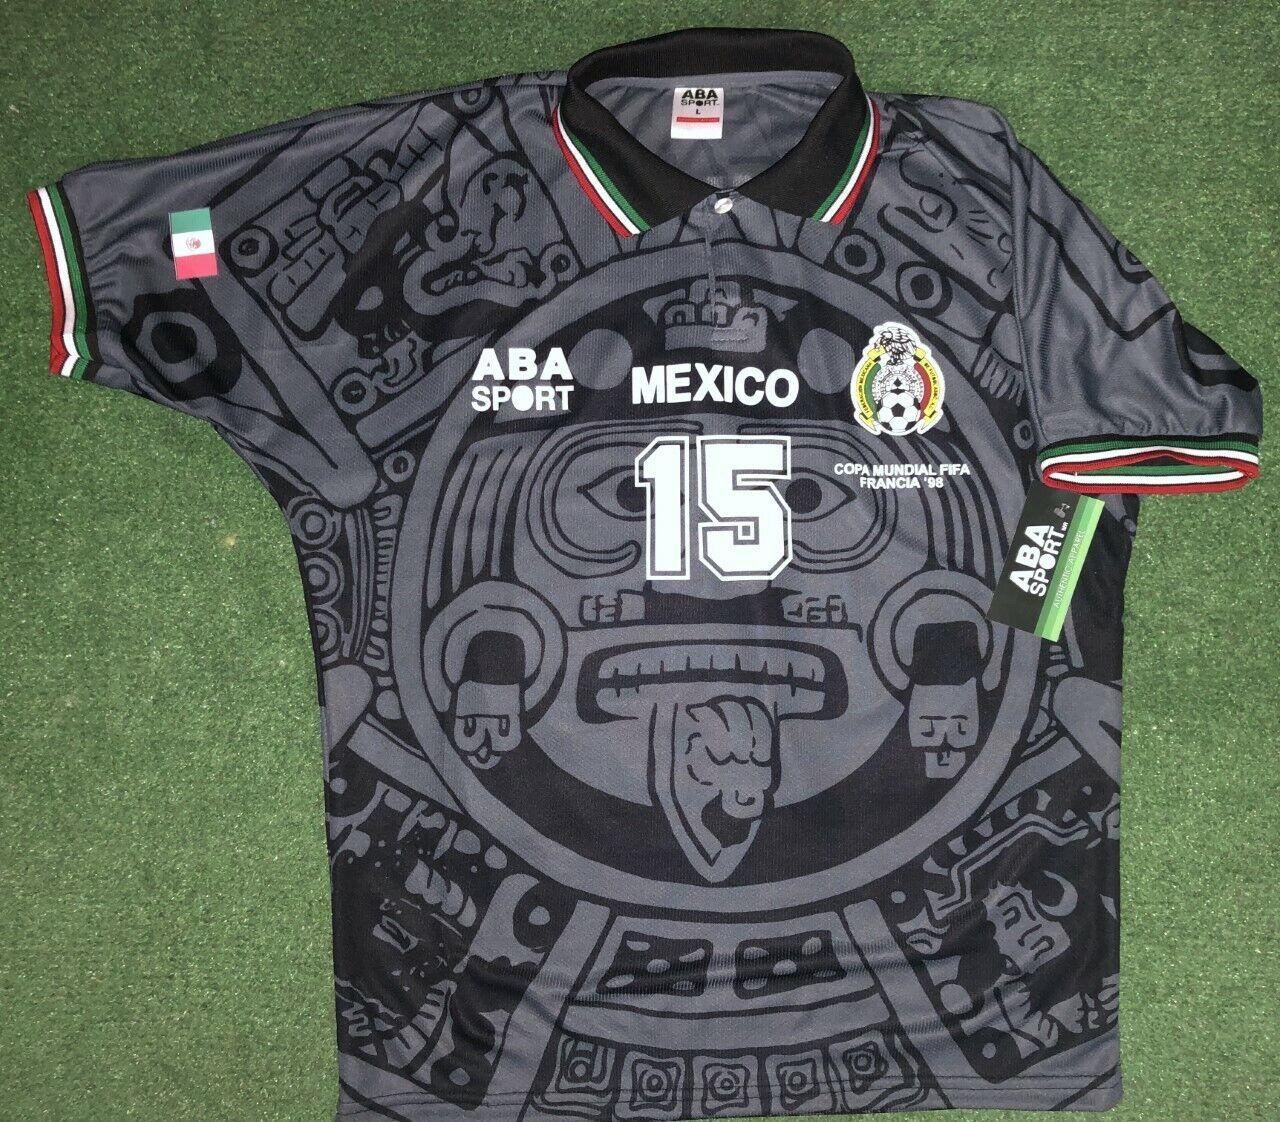 MEXICO1998 LUIS HERNADEZ  , GALA edizione  Diuominiione S , AUTHENTIC SHIRT ABA SPORT